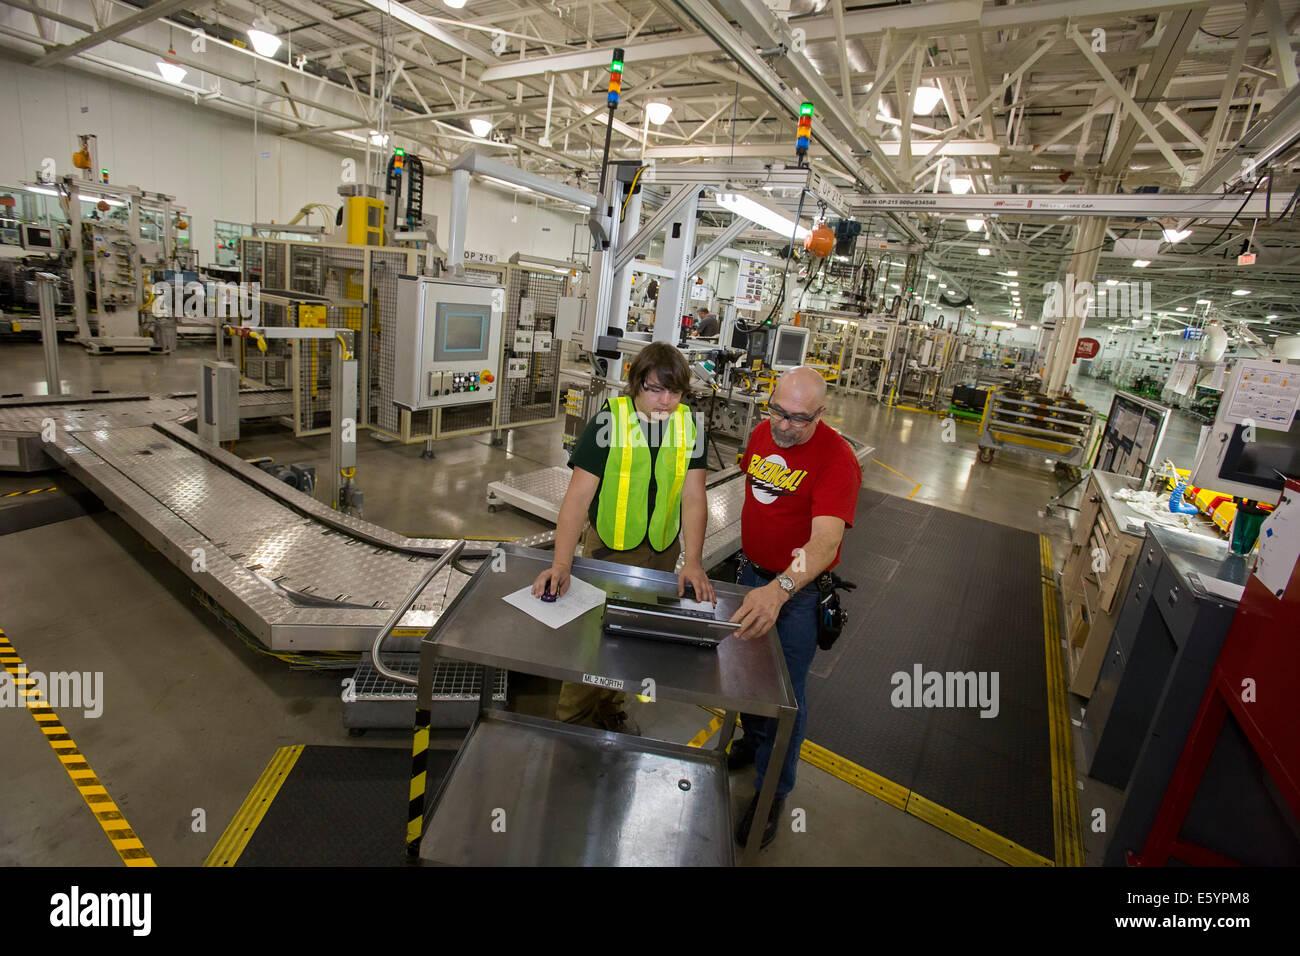 Toledo, Ohio - Student intern at General Motors factory. - Stock Image